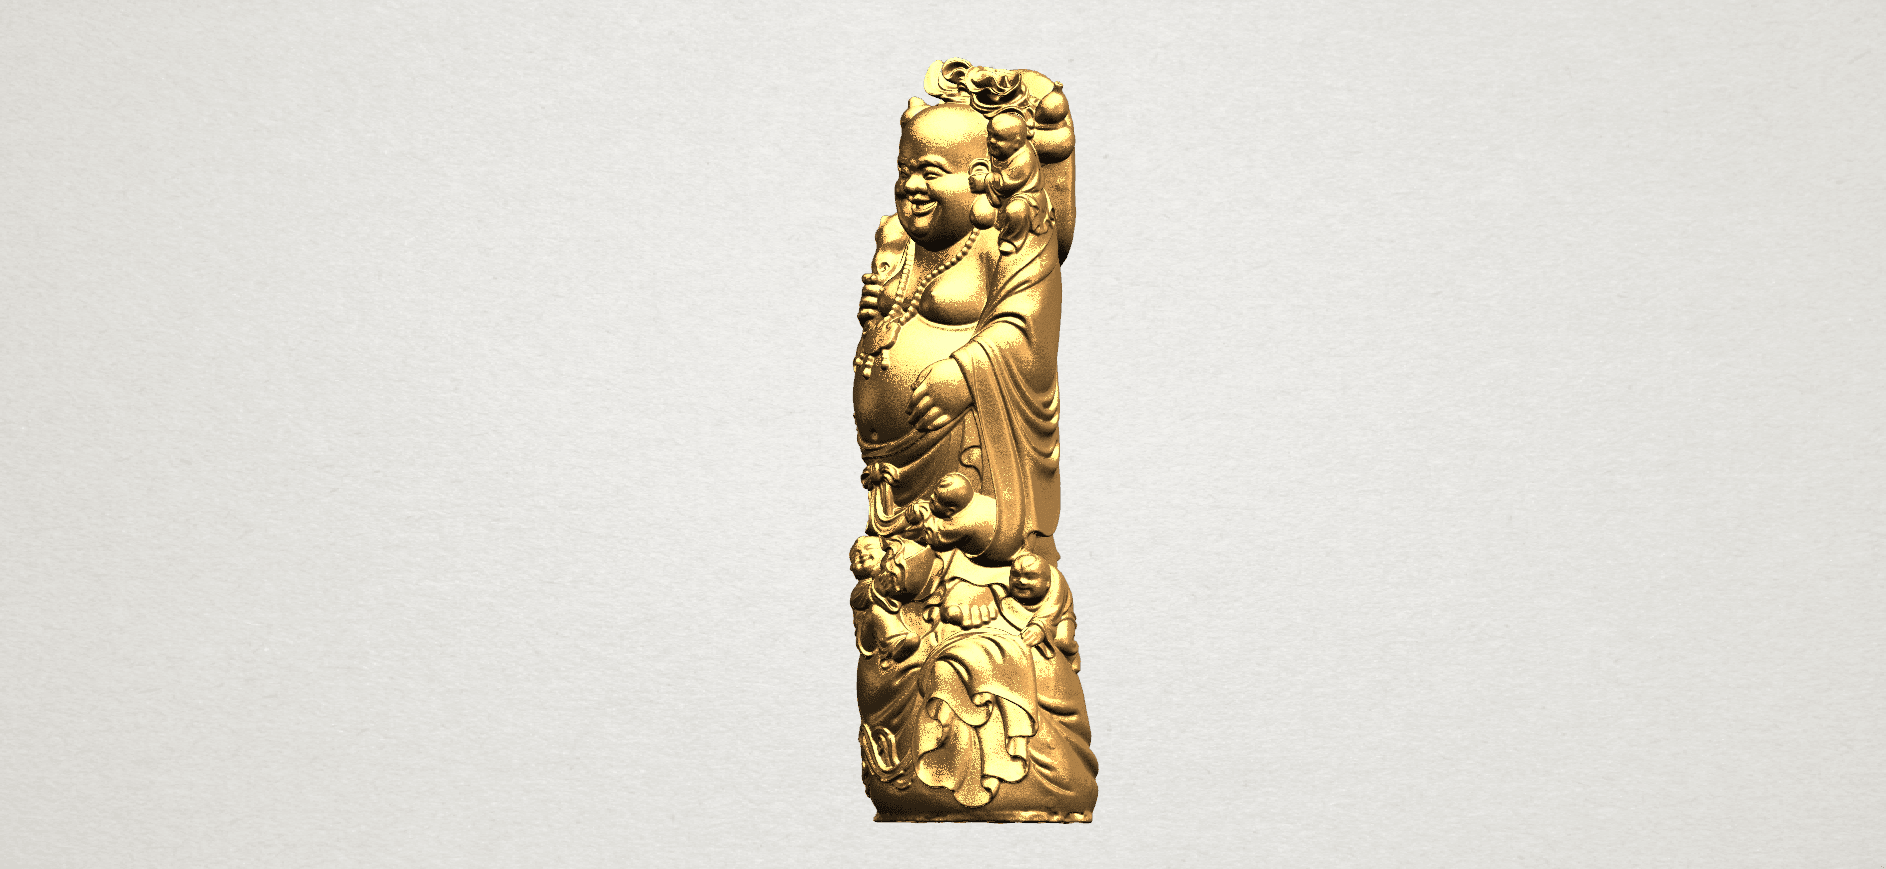 TDA0070 Metteyya Buddha 02 - 88mm - A02.png Download free STL file Metteyya Buddha 02 • 3D printer object, GeorgesNikkei